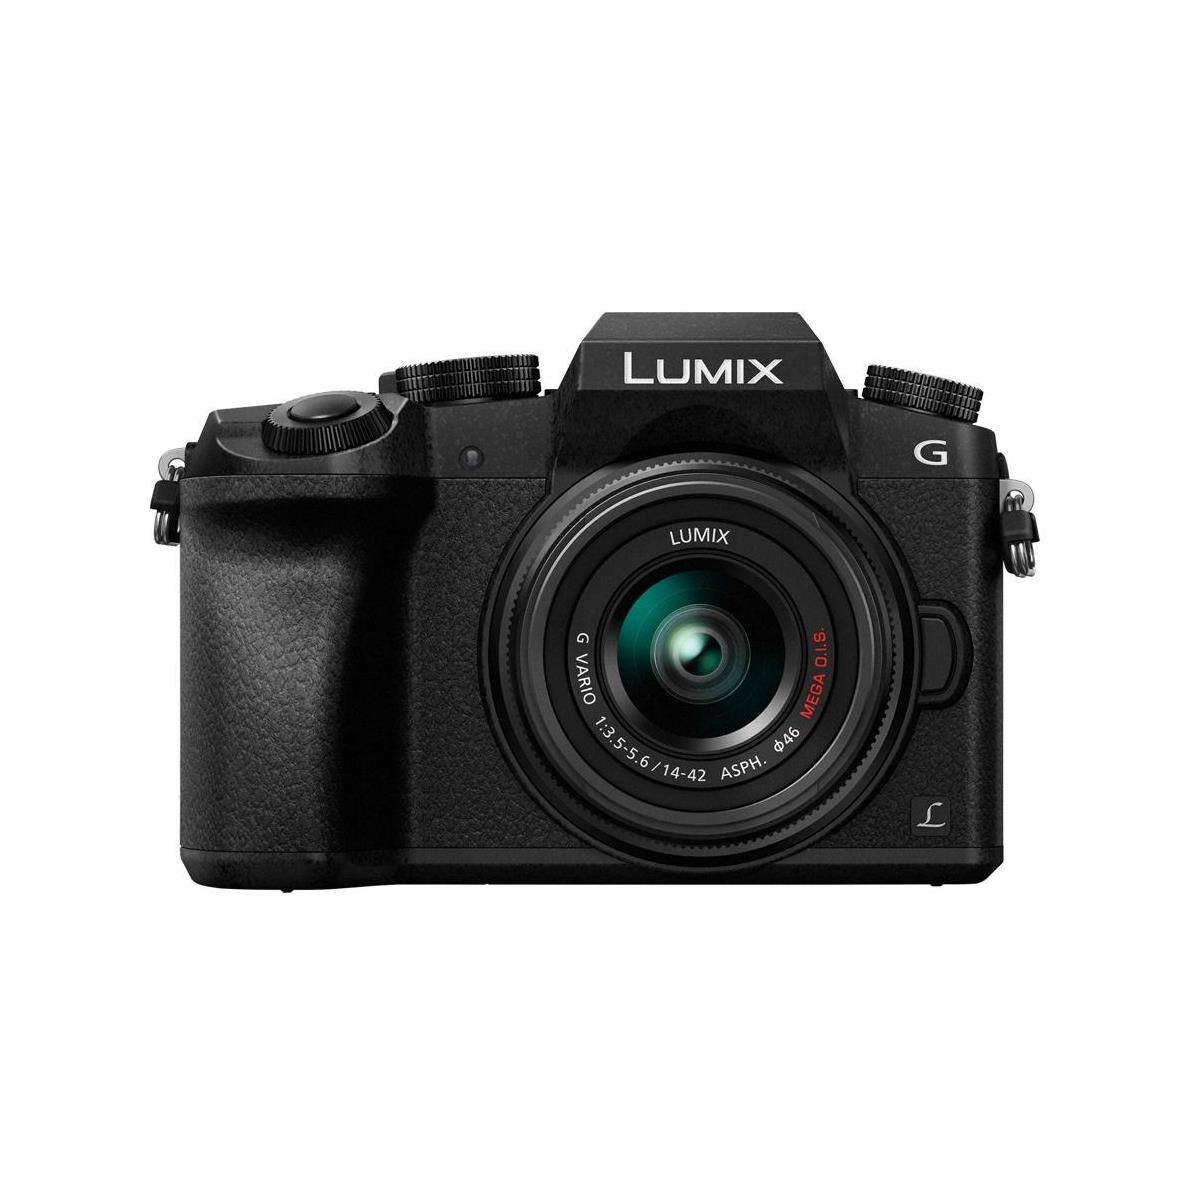 Panasonic DMC-G7 Mirrorless Camera + 14-42mm Lens $498 & More + free shipping